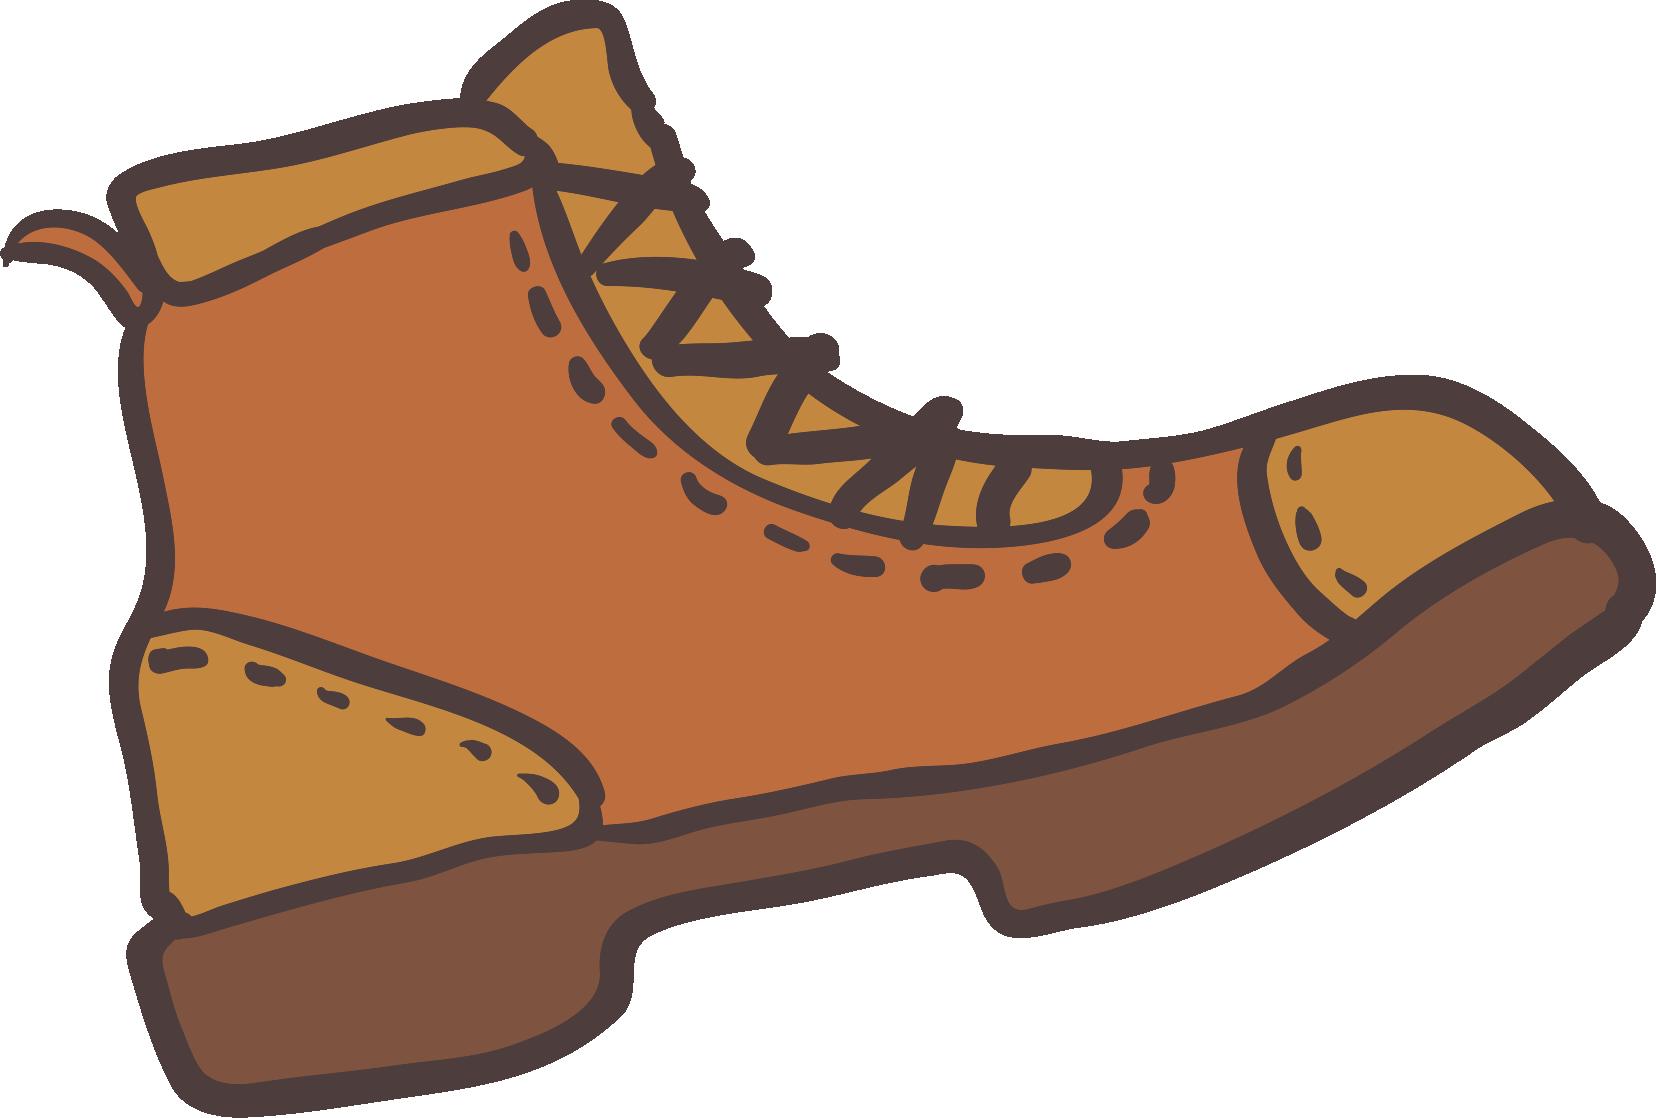 Boot Clip Art Outdoor Boots Transprent Png.